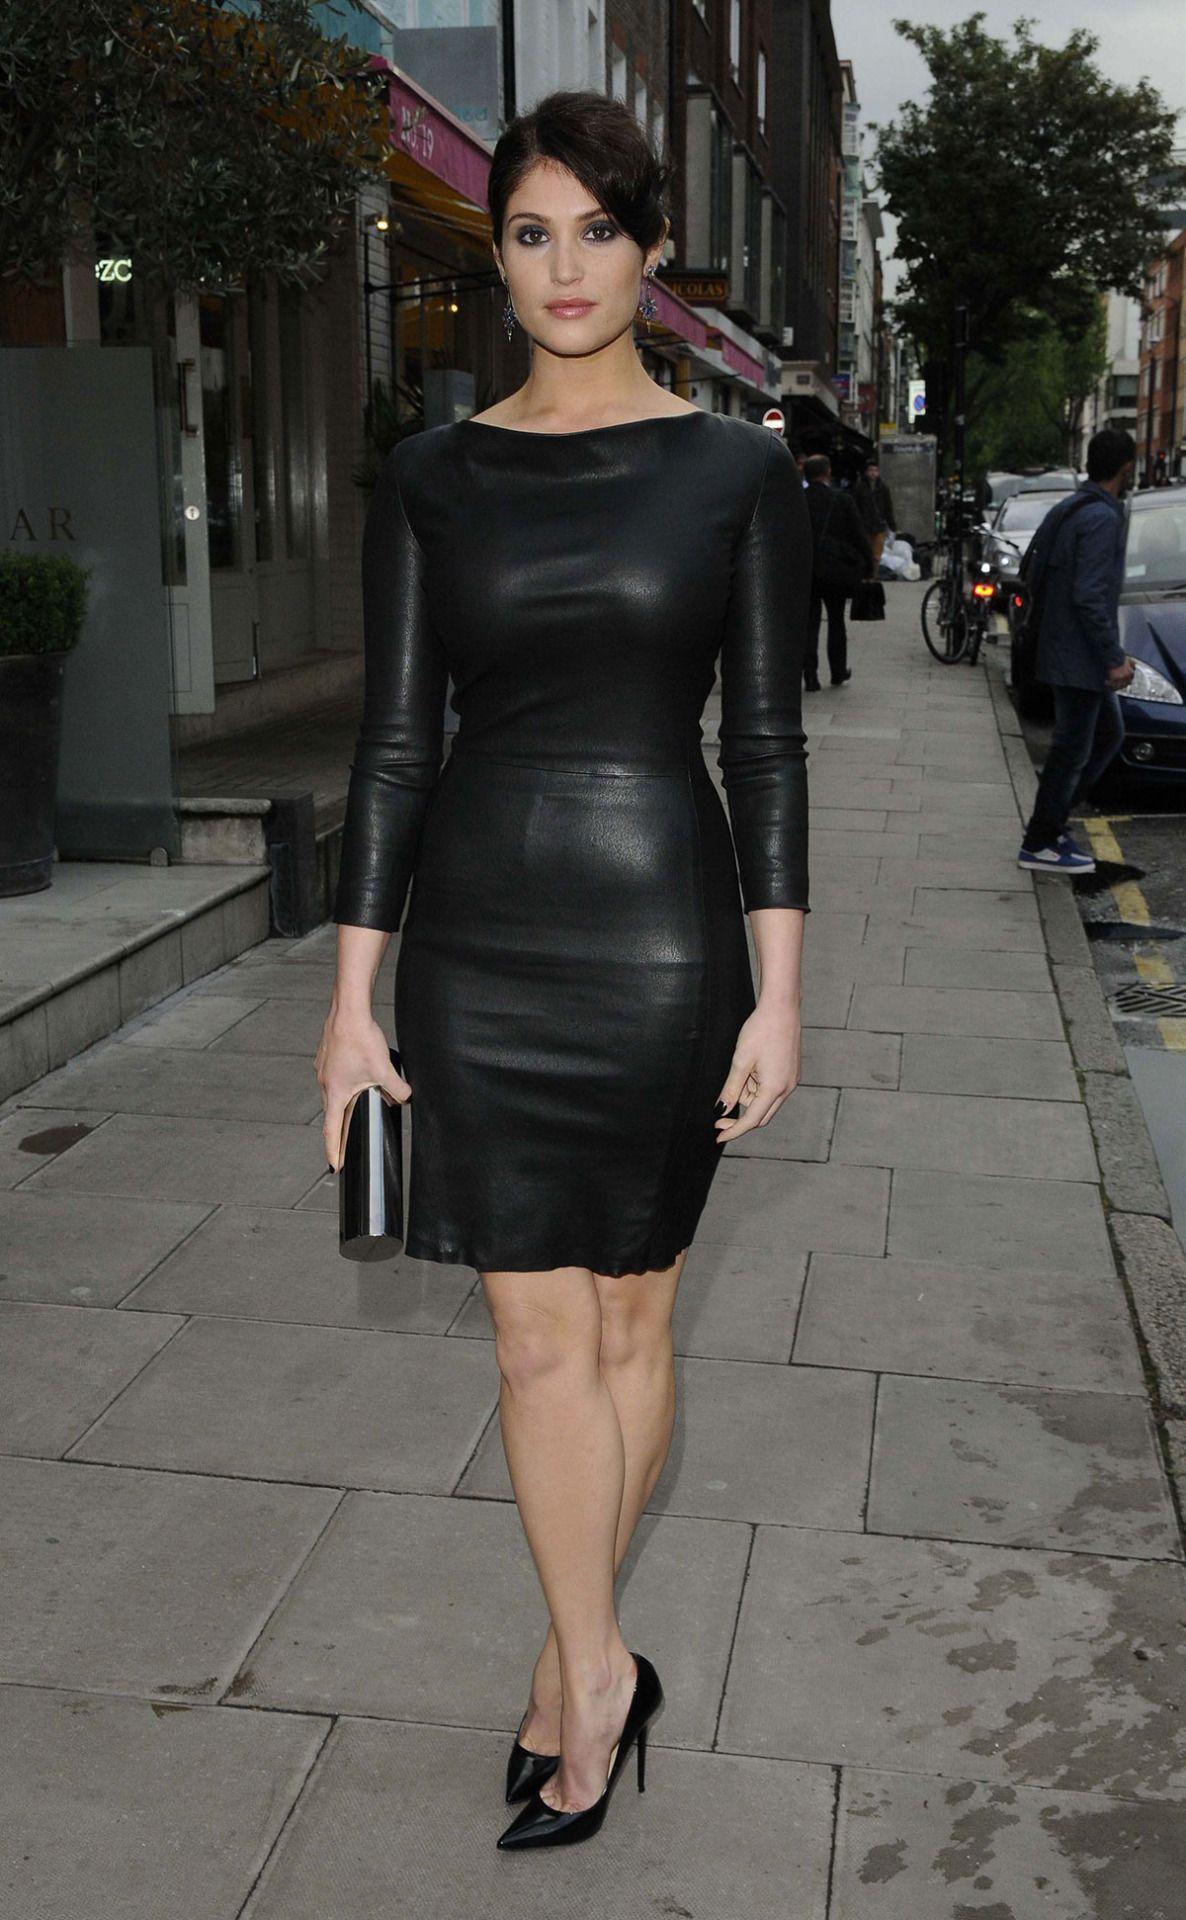 Gemma Arterton looks damn hot in a black leather dress